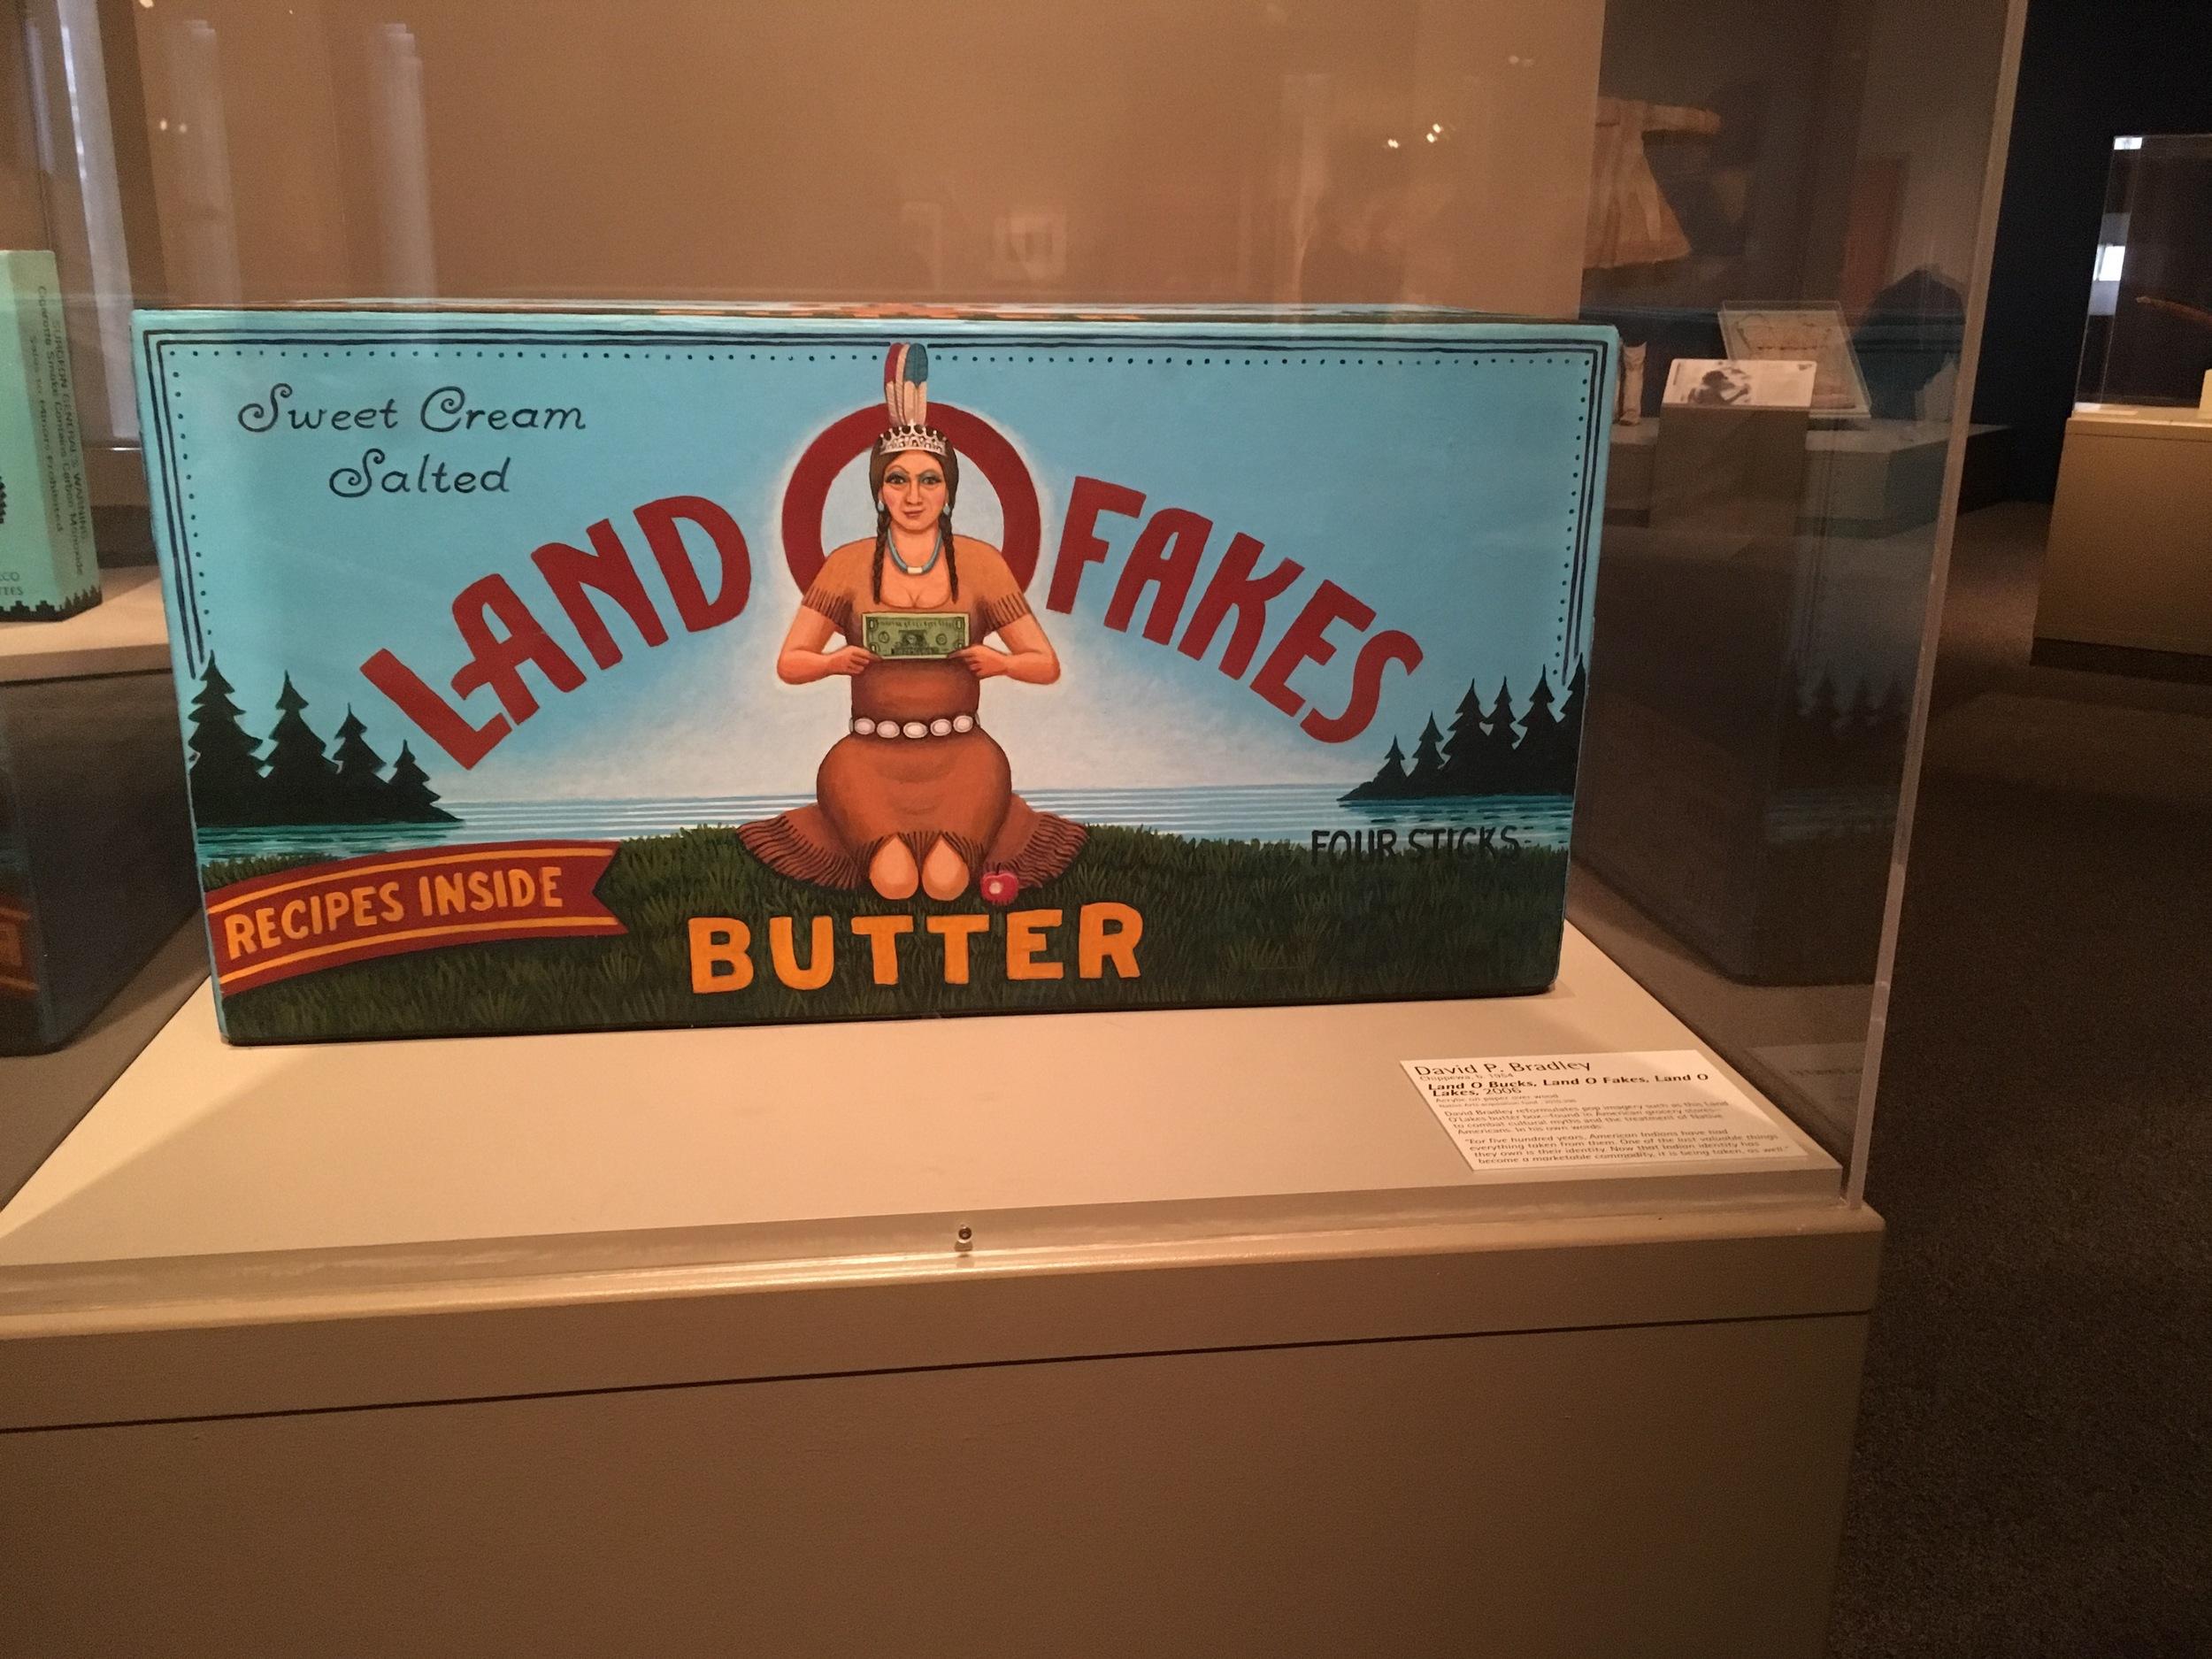 Land o Bucks, Land o Fakes, Land o Lakes- David P. Bradley, 2006.